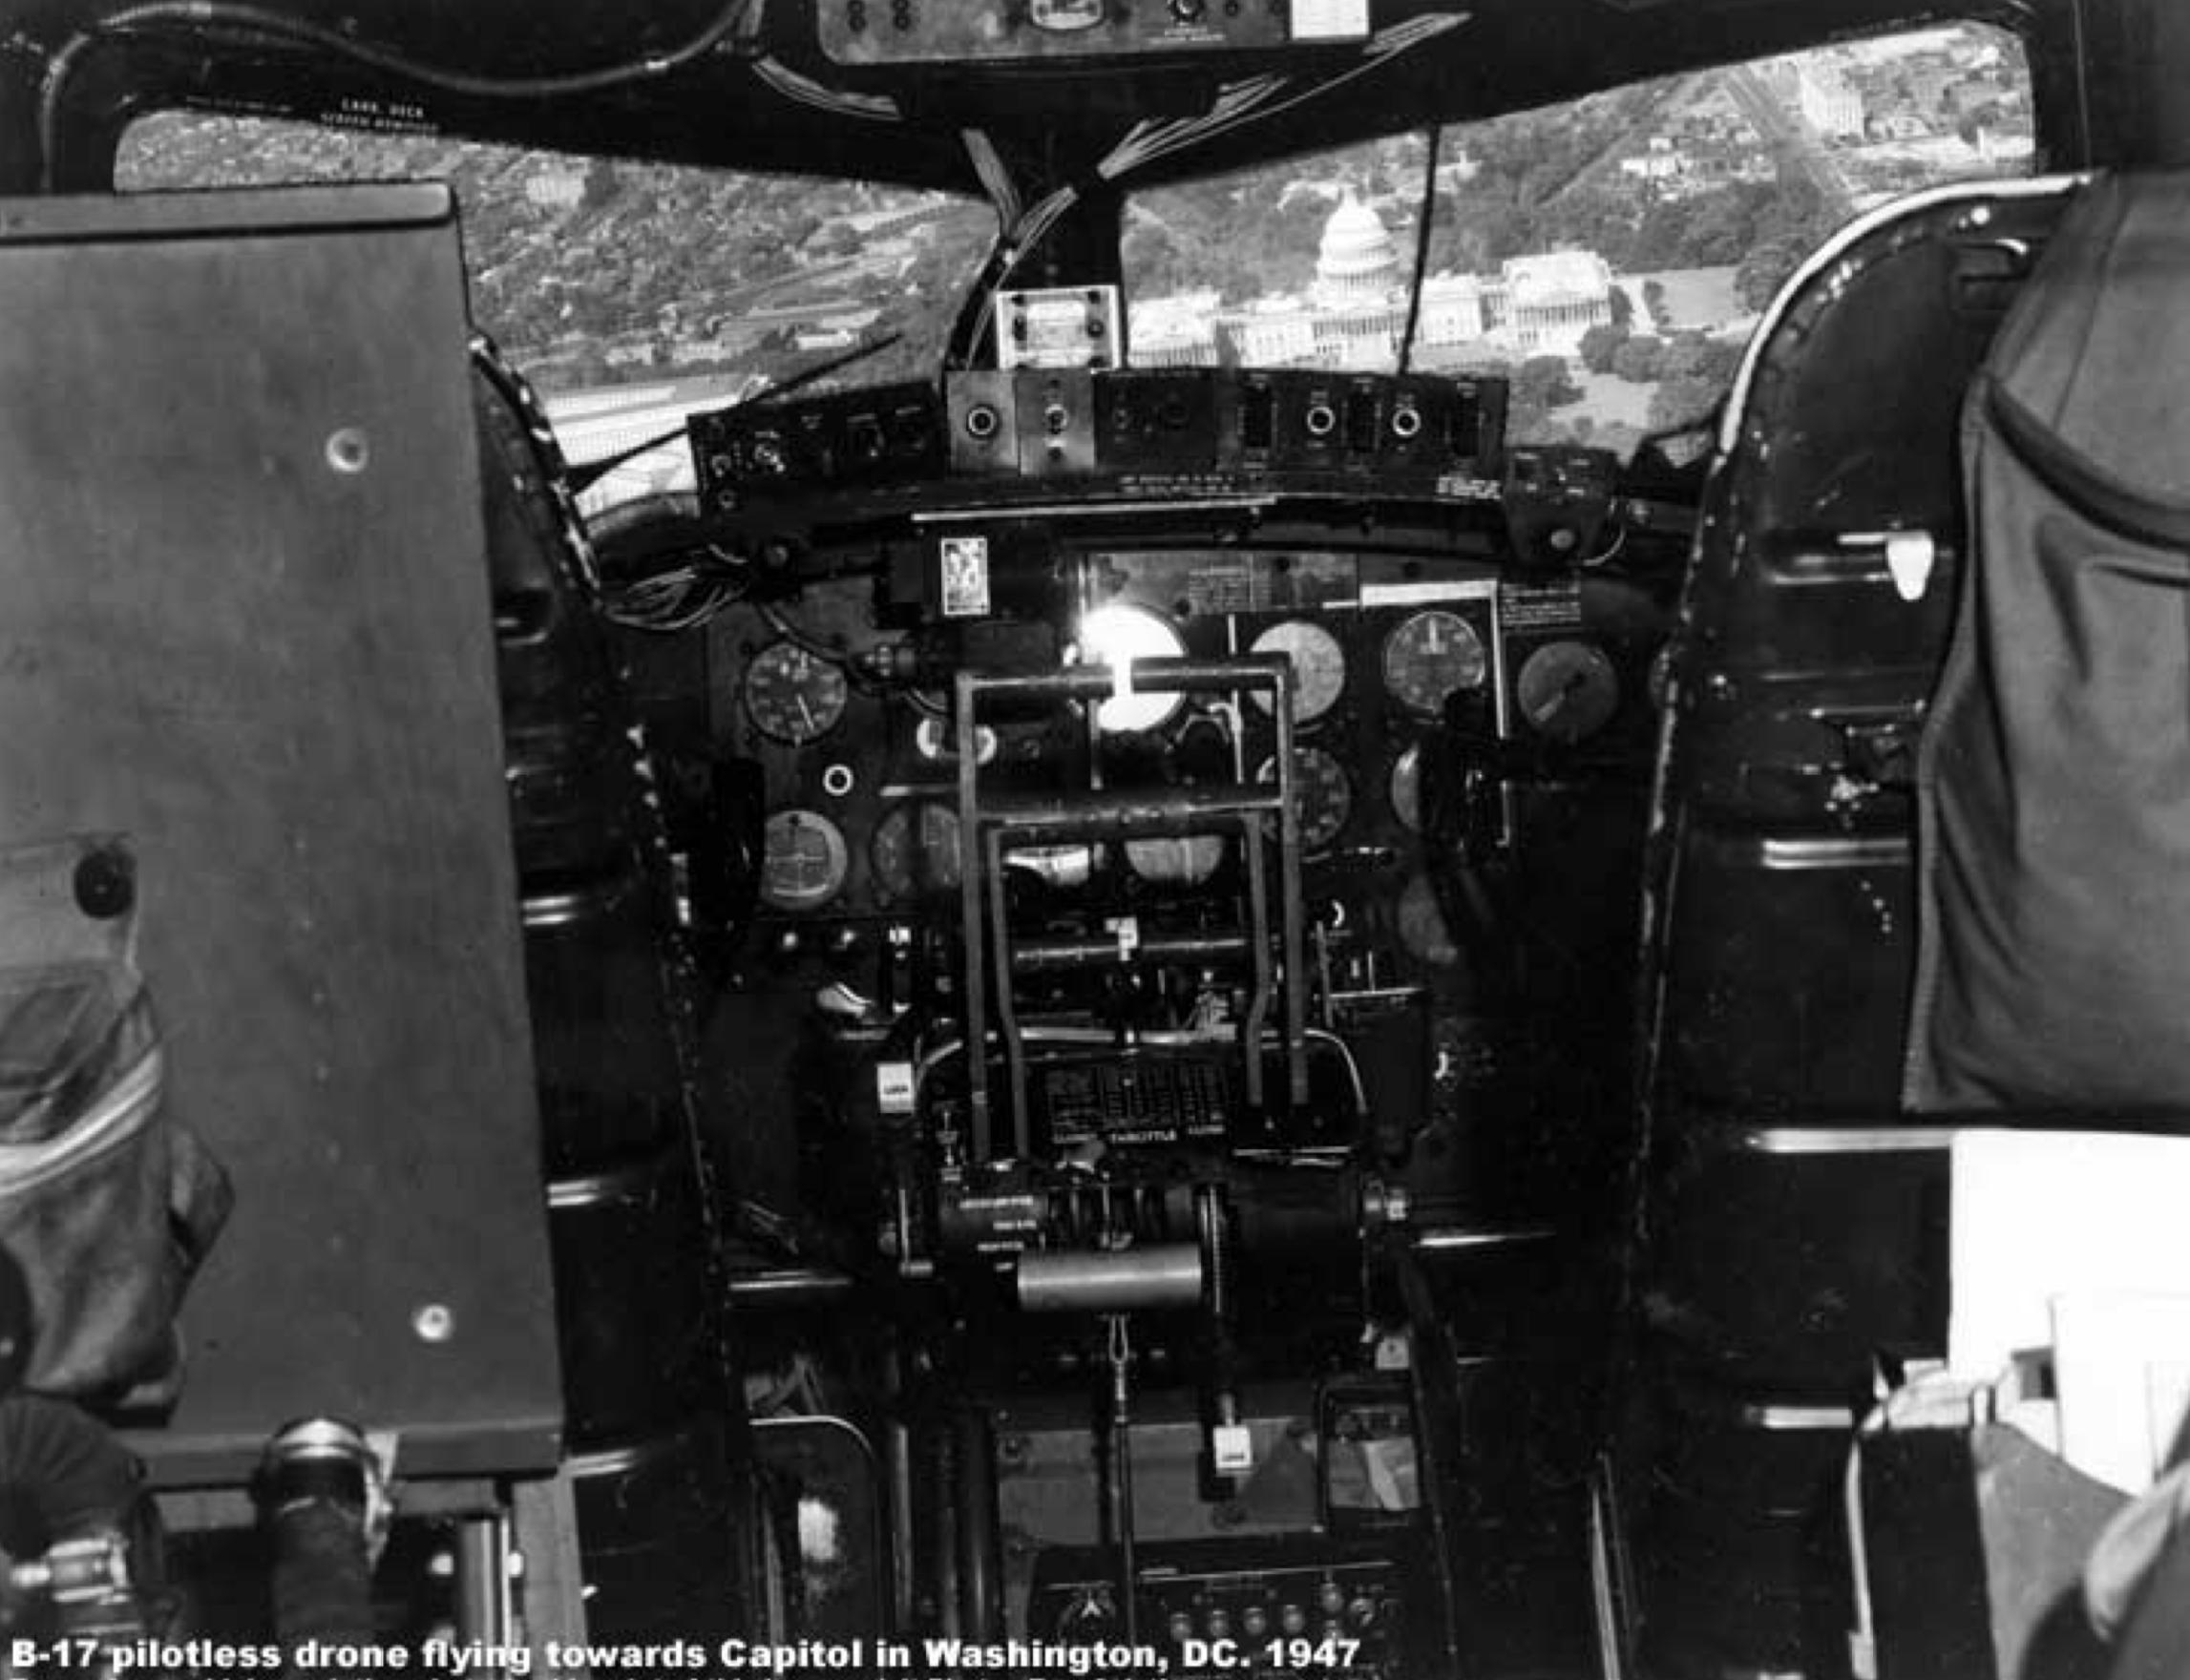 B-17 Drone WWII